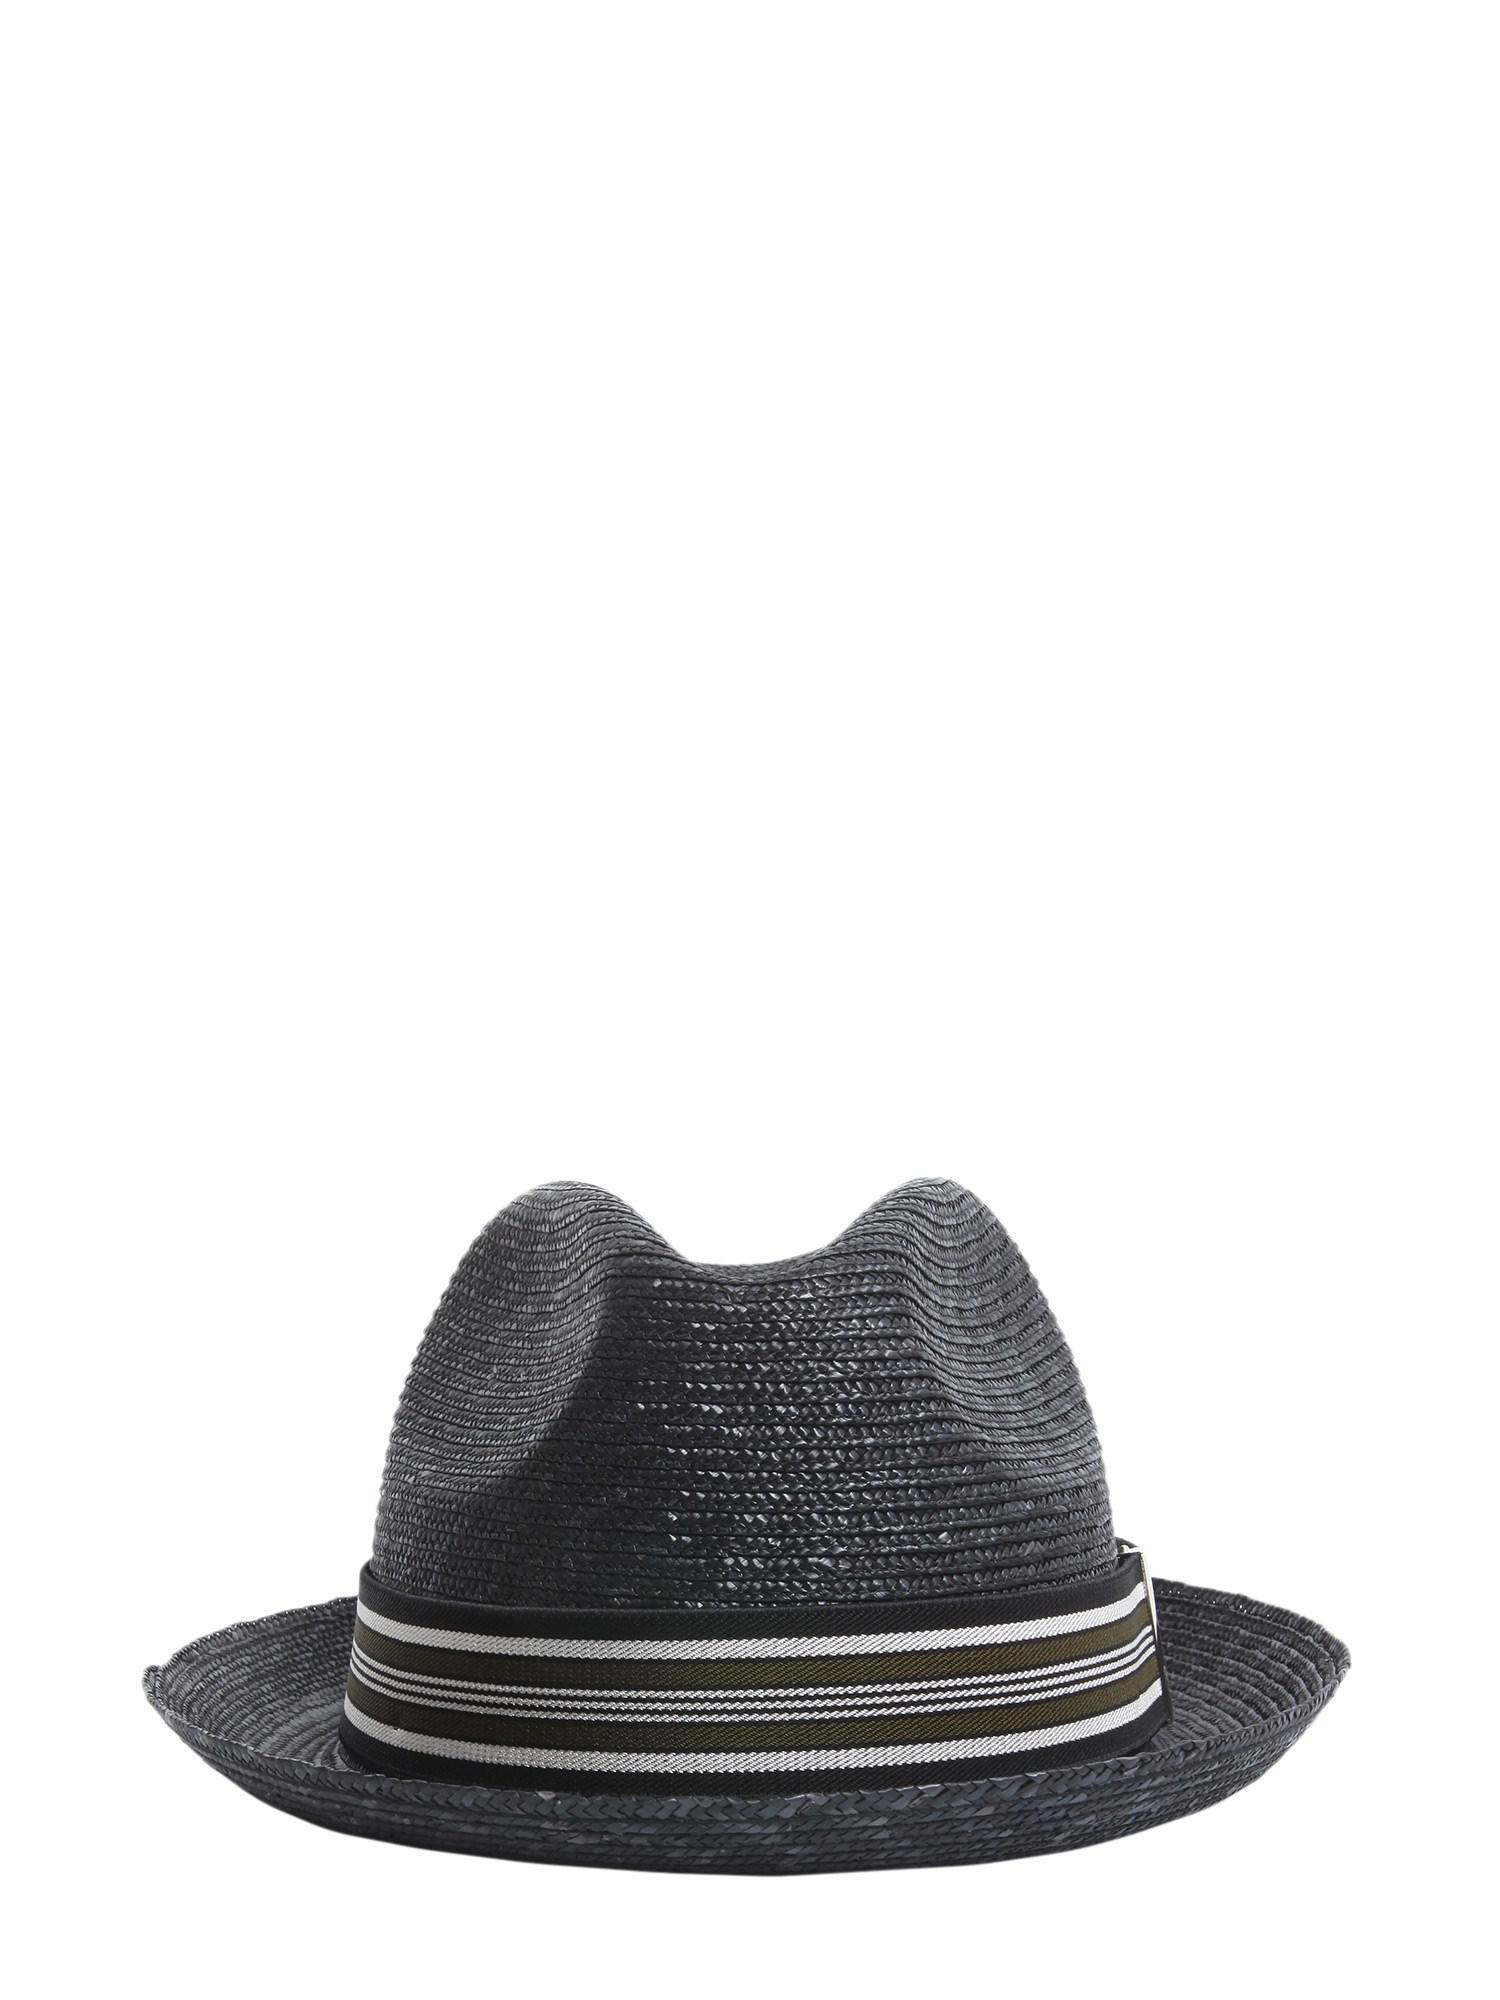 effef49a888 Lyst - Borsalino Suspender Straw Cap in Black for Men